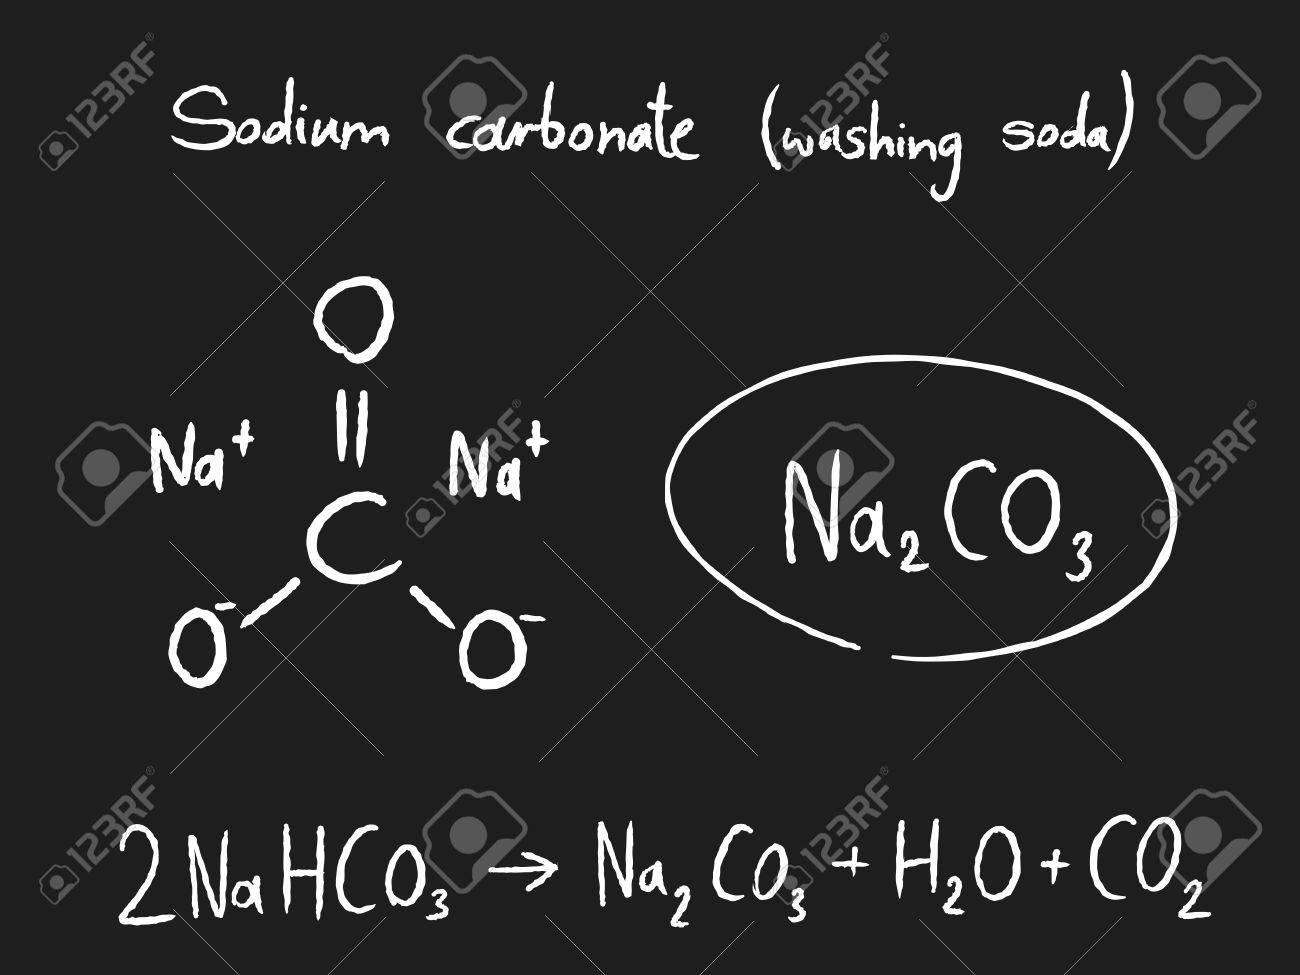 Sodium carbonate (washing soda) - chemistry lesson  Science education